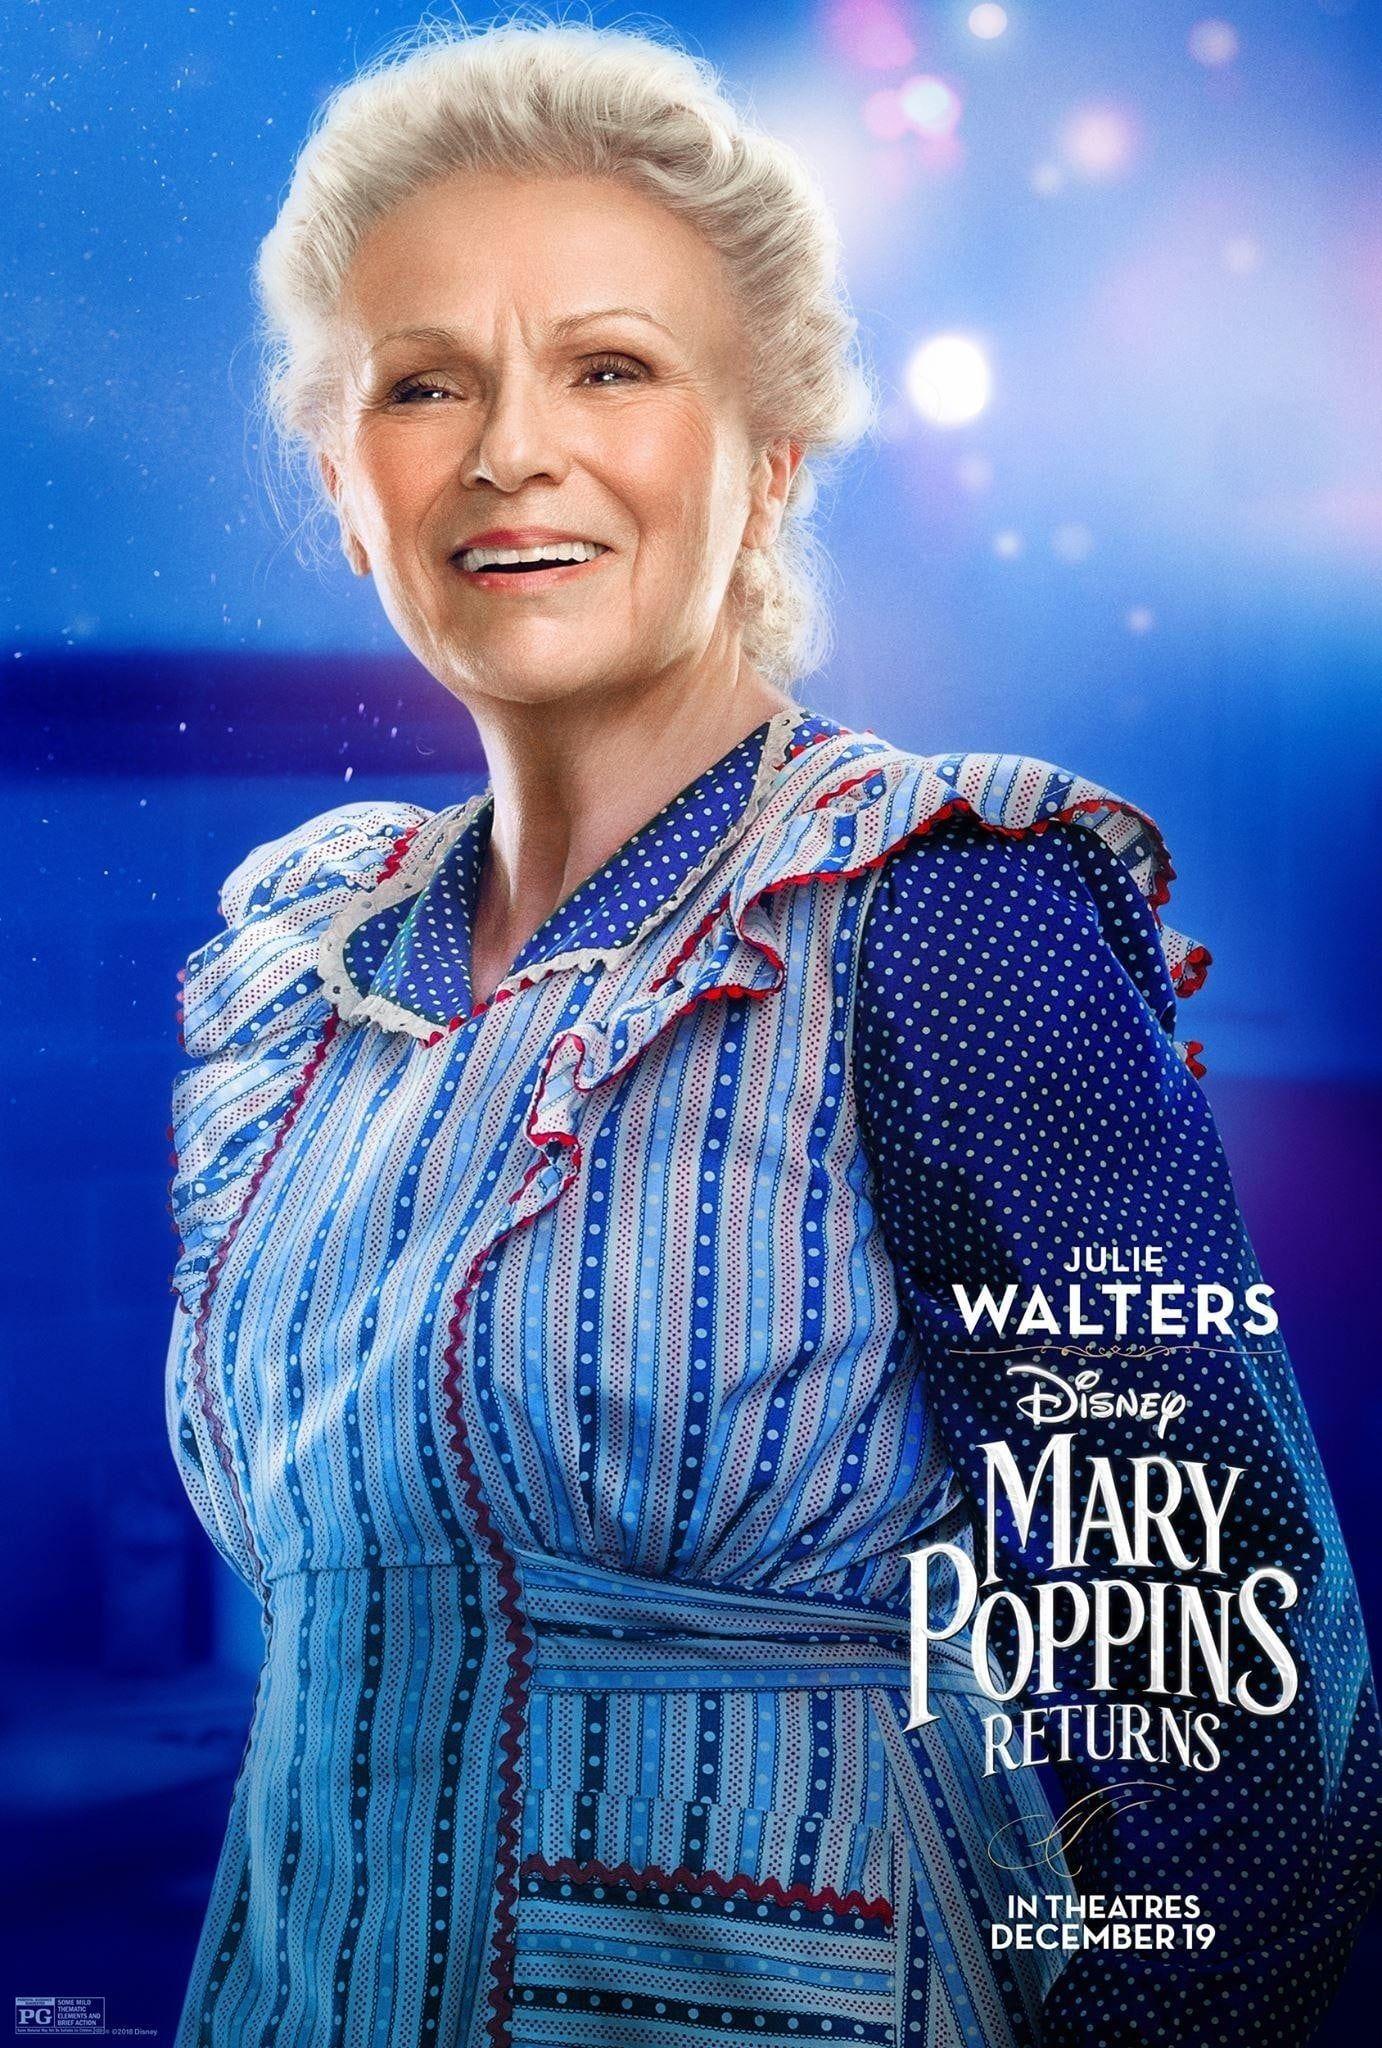 2018 Ver Mary Poppins Returns Pelicula Completa Dvd Mega Latino 2018 En Latino Películas Completas Mary Poppins Películas En Línea Gratis